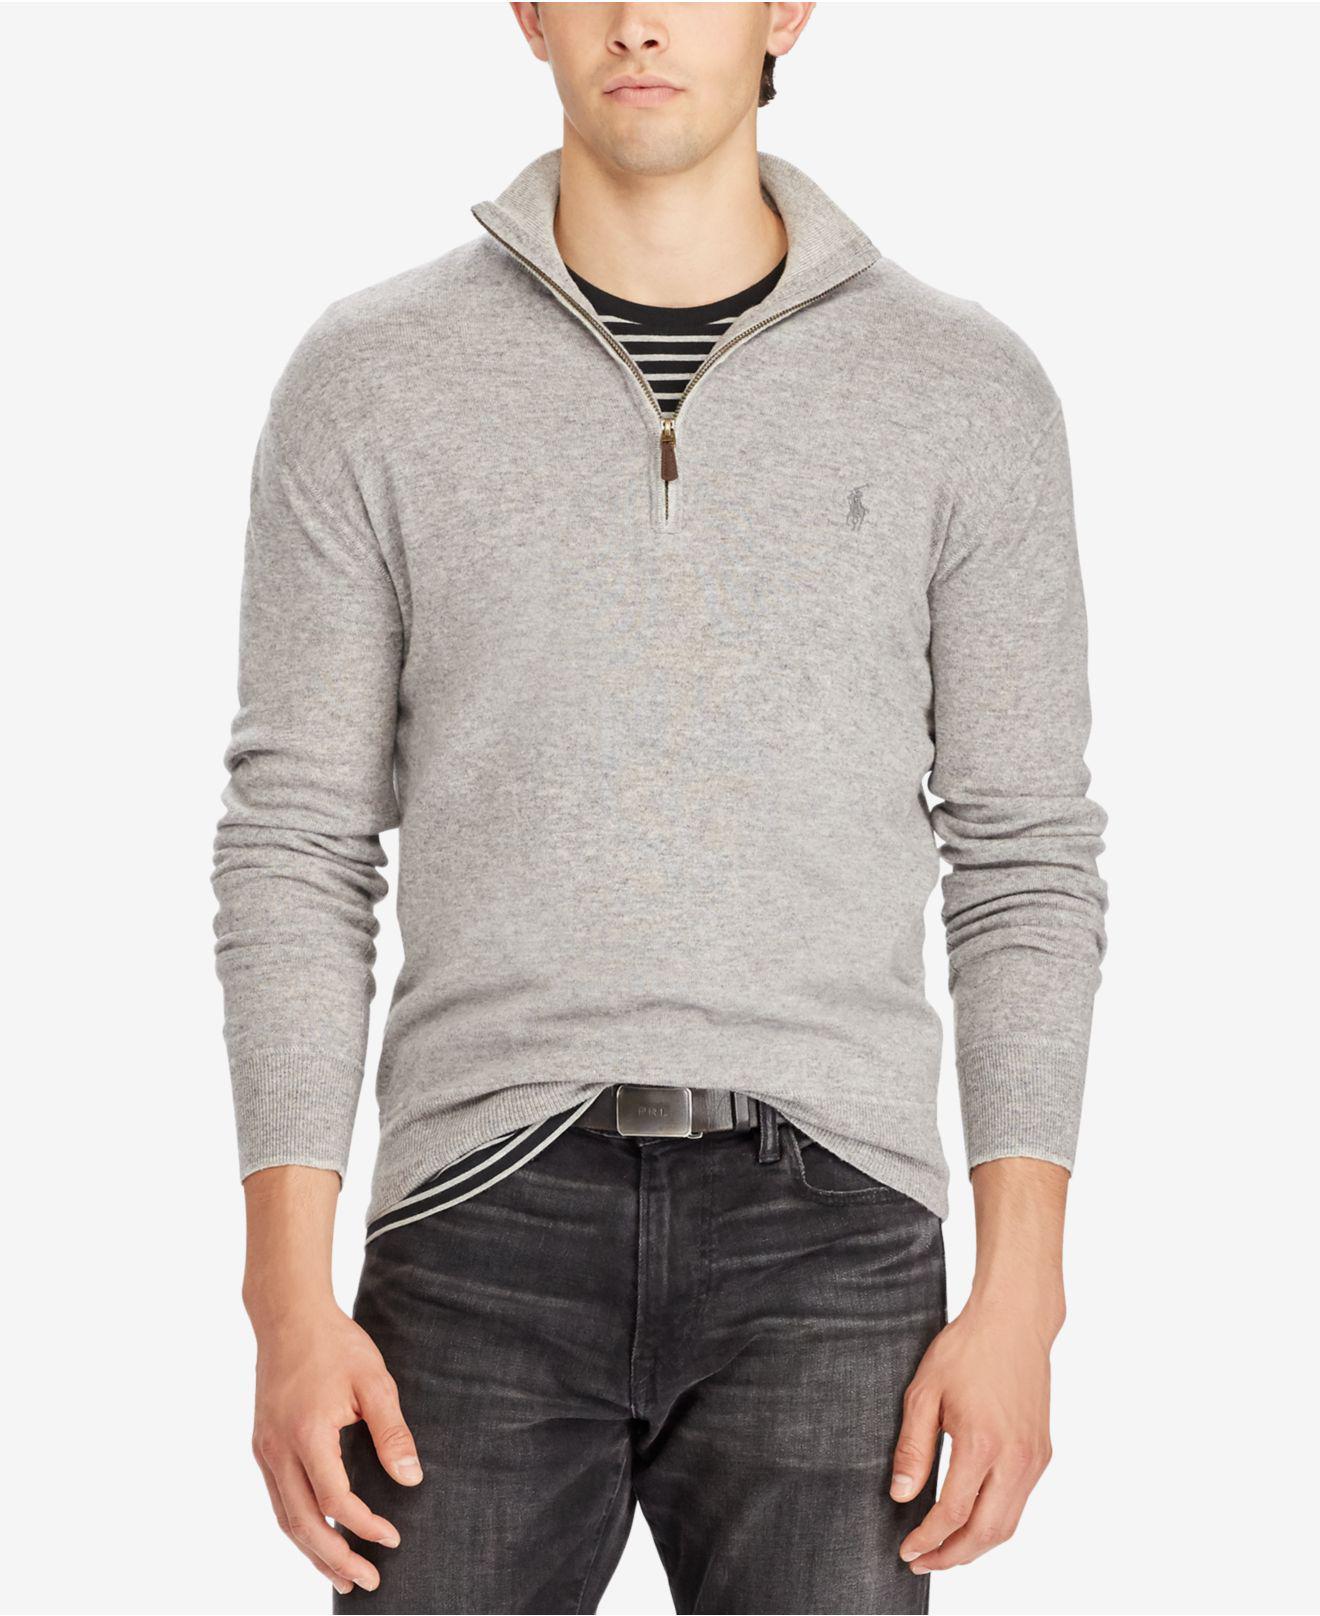 C10e6 Lauren Menu Collar Shawl Top Polo Womens Sweater Ralph Quality yYb7gv6f